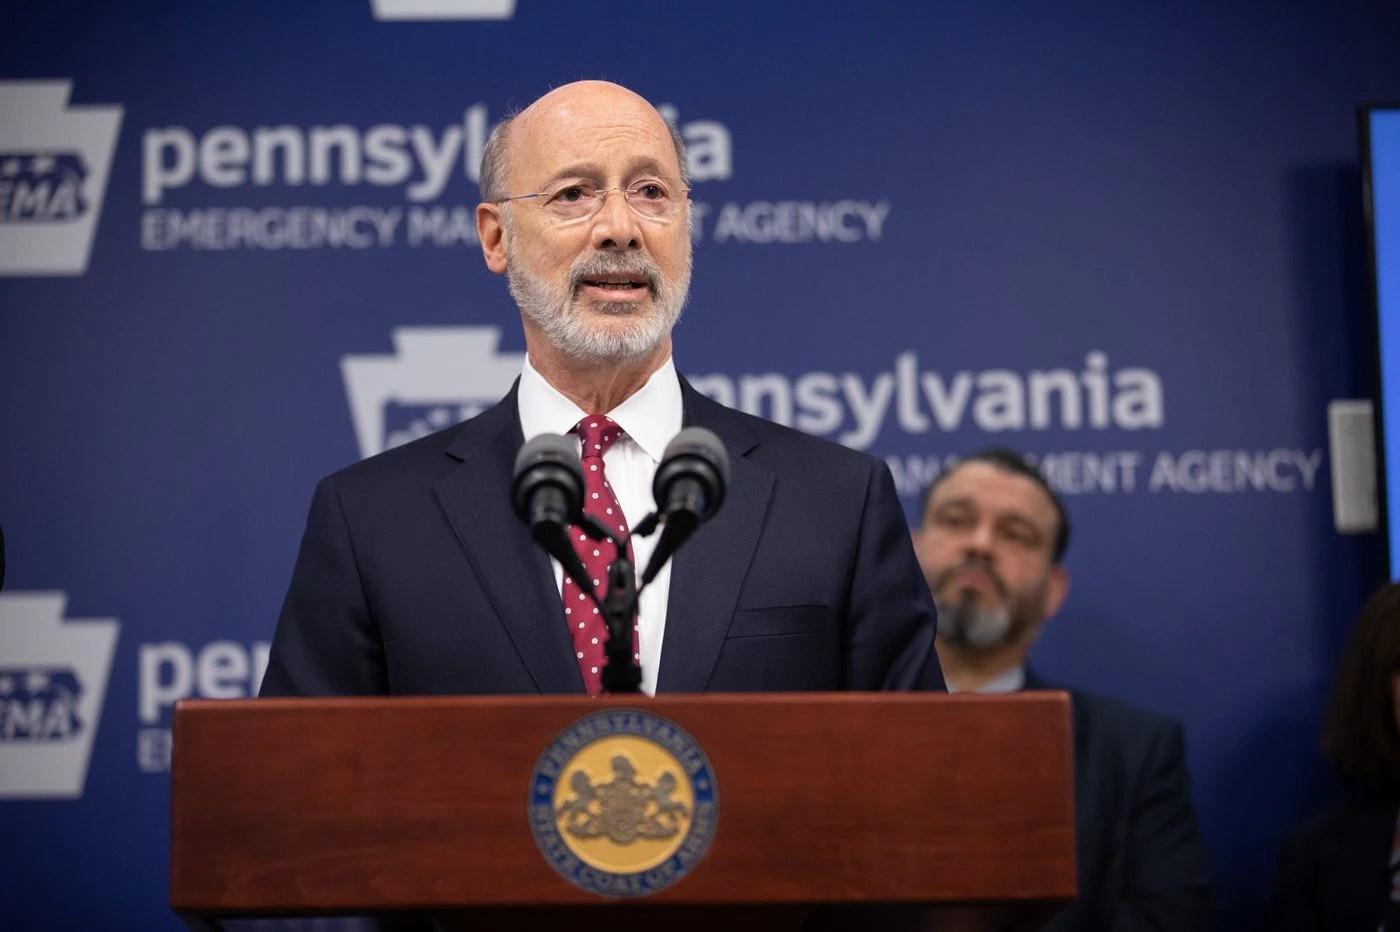 Pa. may delay presidential primary election amid coronavirus